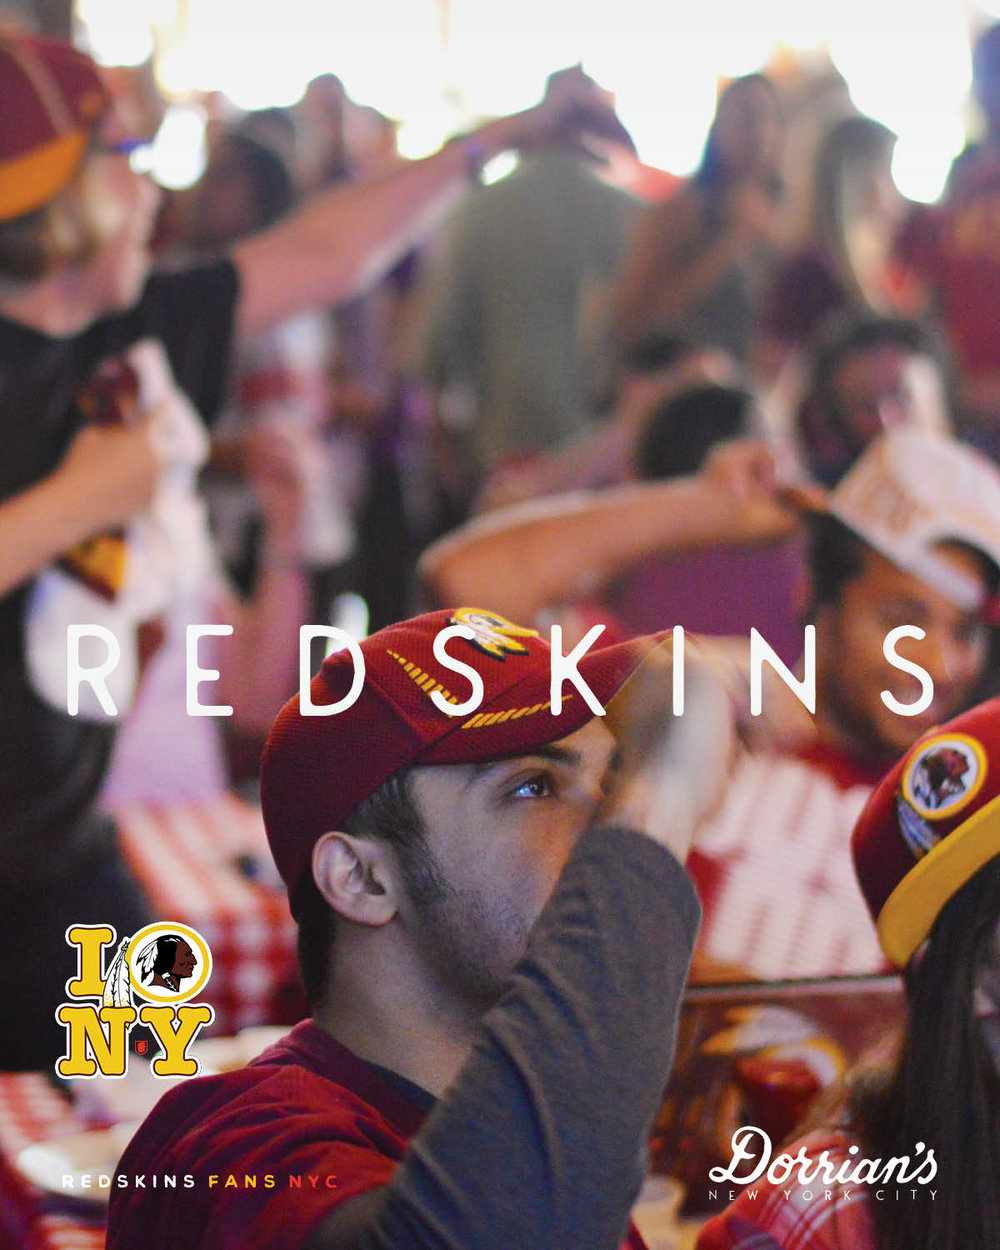 drh_nyc-2018-insta-redskins-bar-cheering-55.jpg